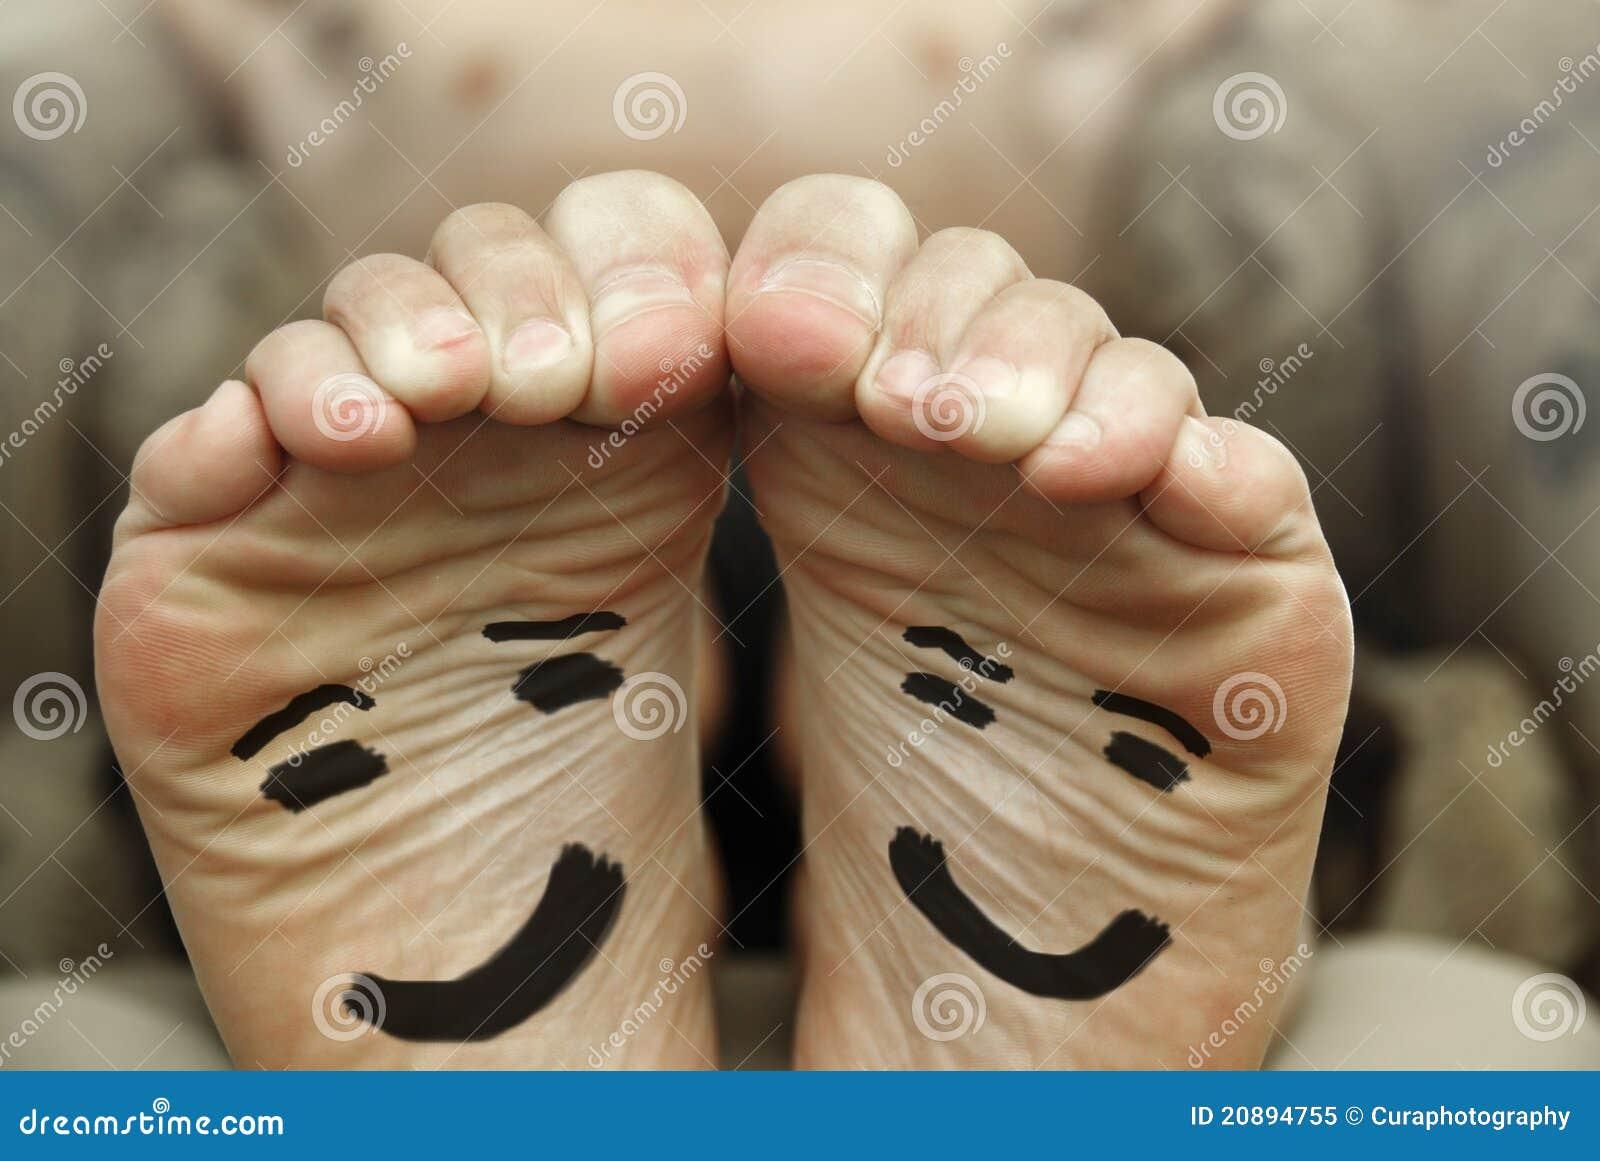 business plan happy feet llc a Happy feet podiatry llc, west orange, new jersey 235 likes  happy feet  podiatry llc updated their business hours  we accept most insurance plans.